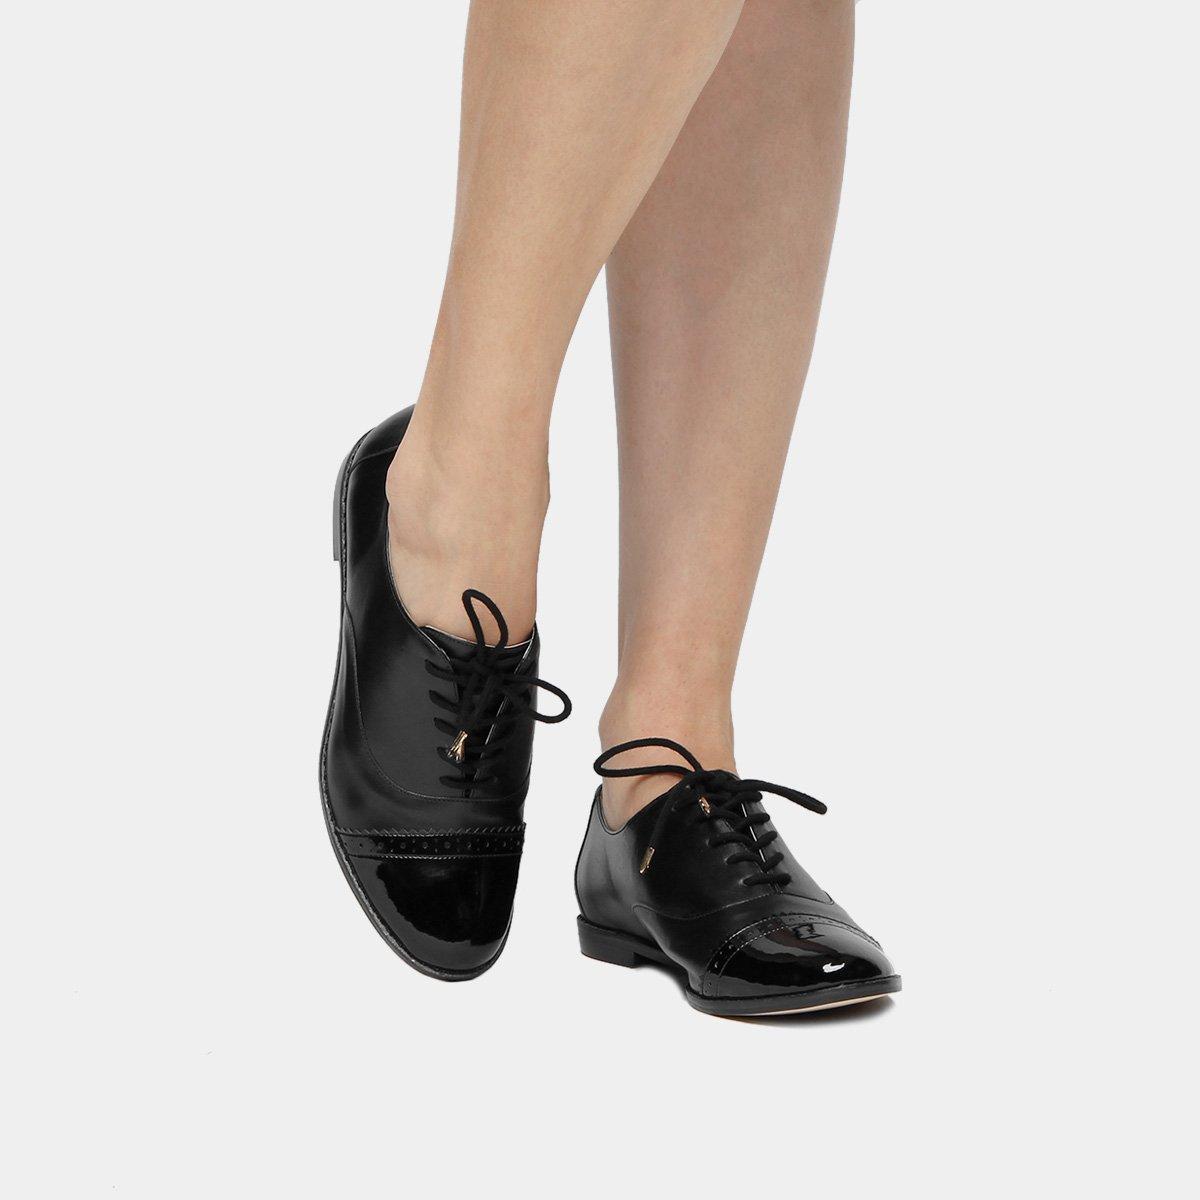 42a3468c0b Oxford Couro Shoestock Brogues Bicolor Feminino